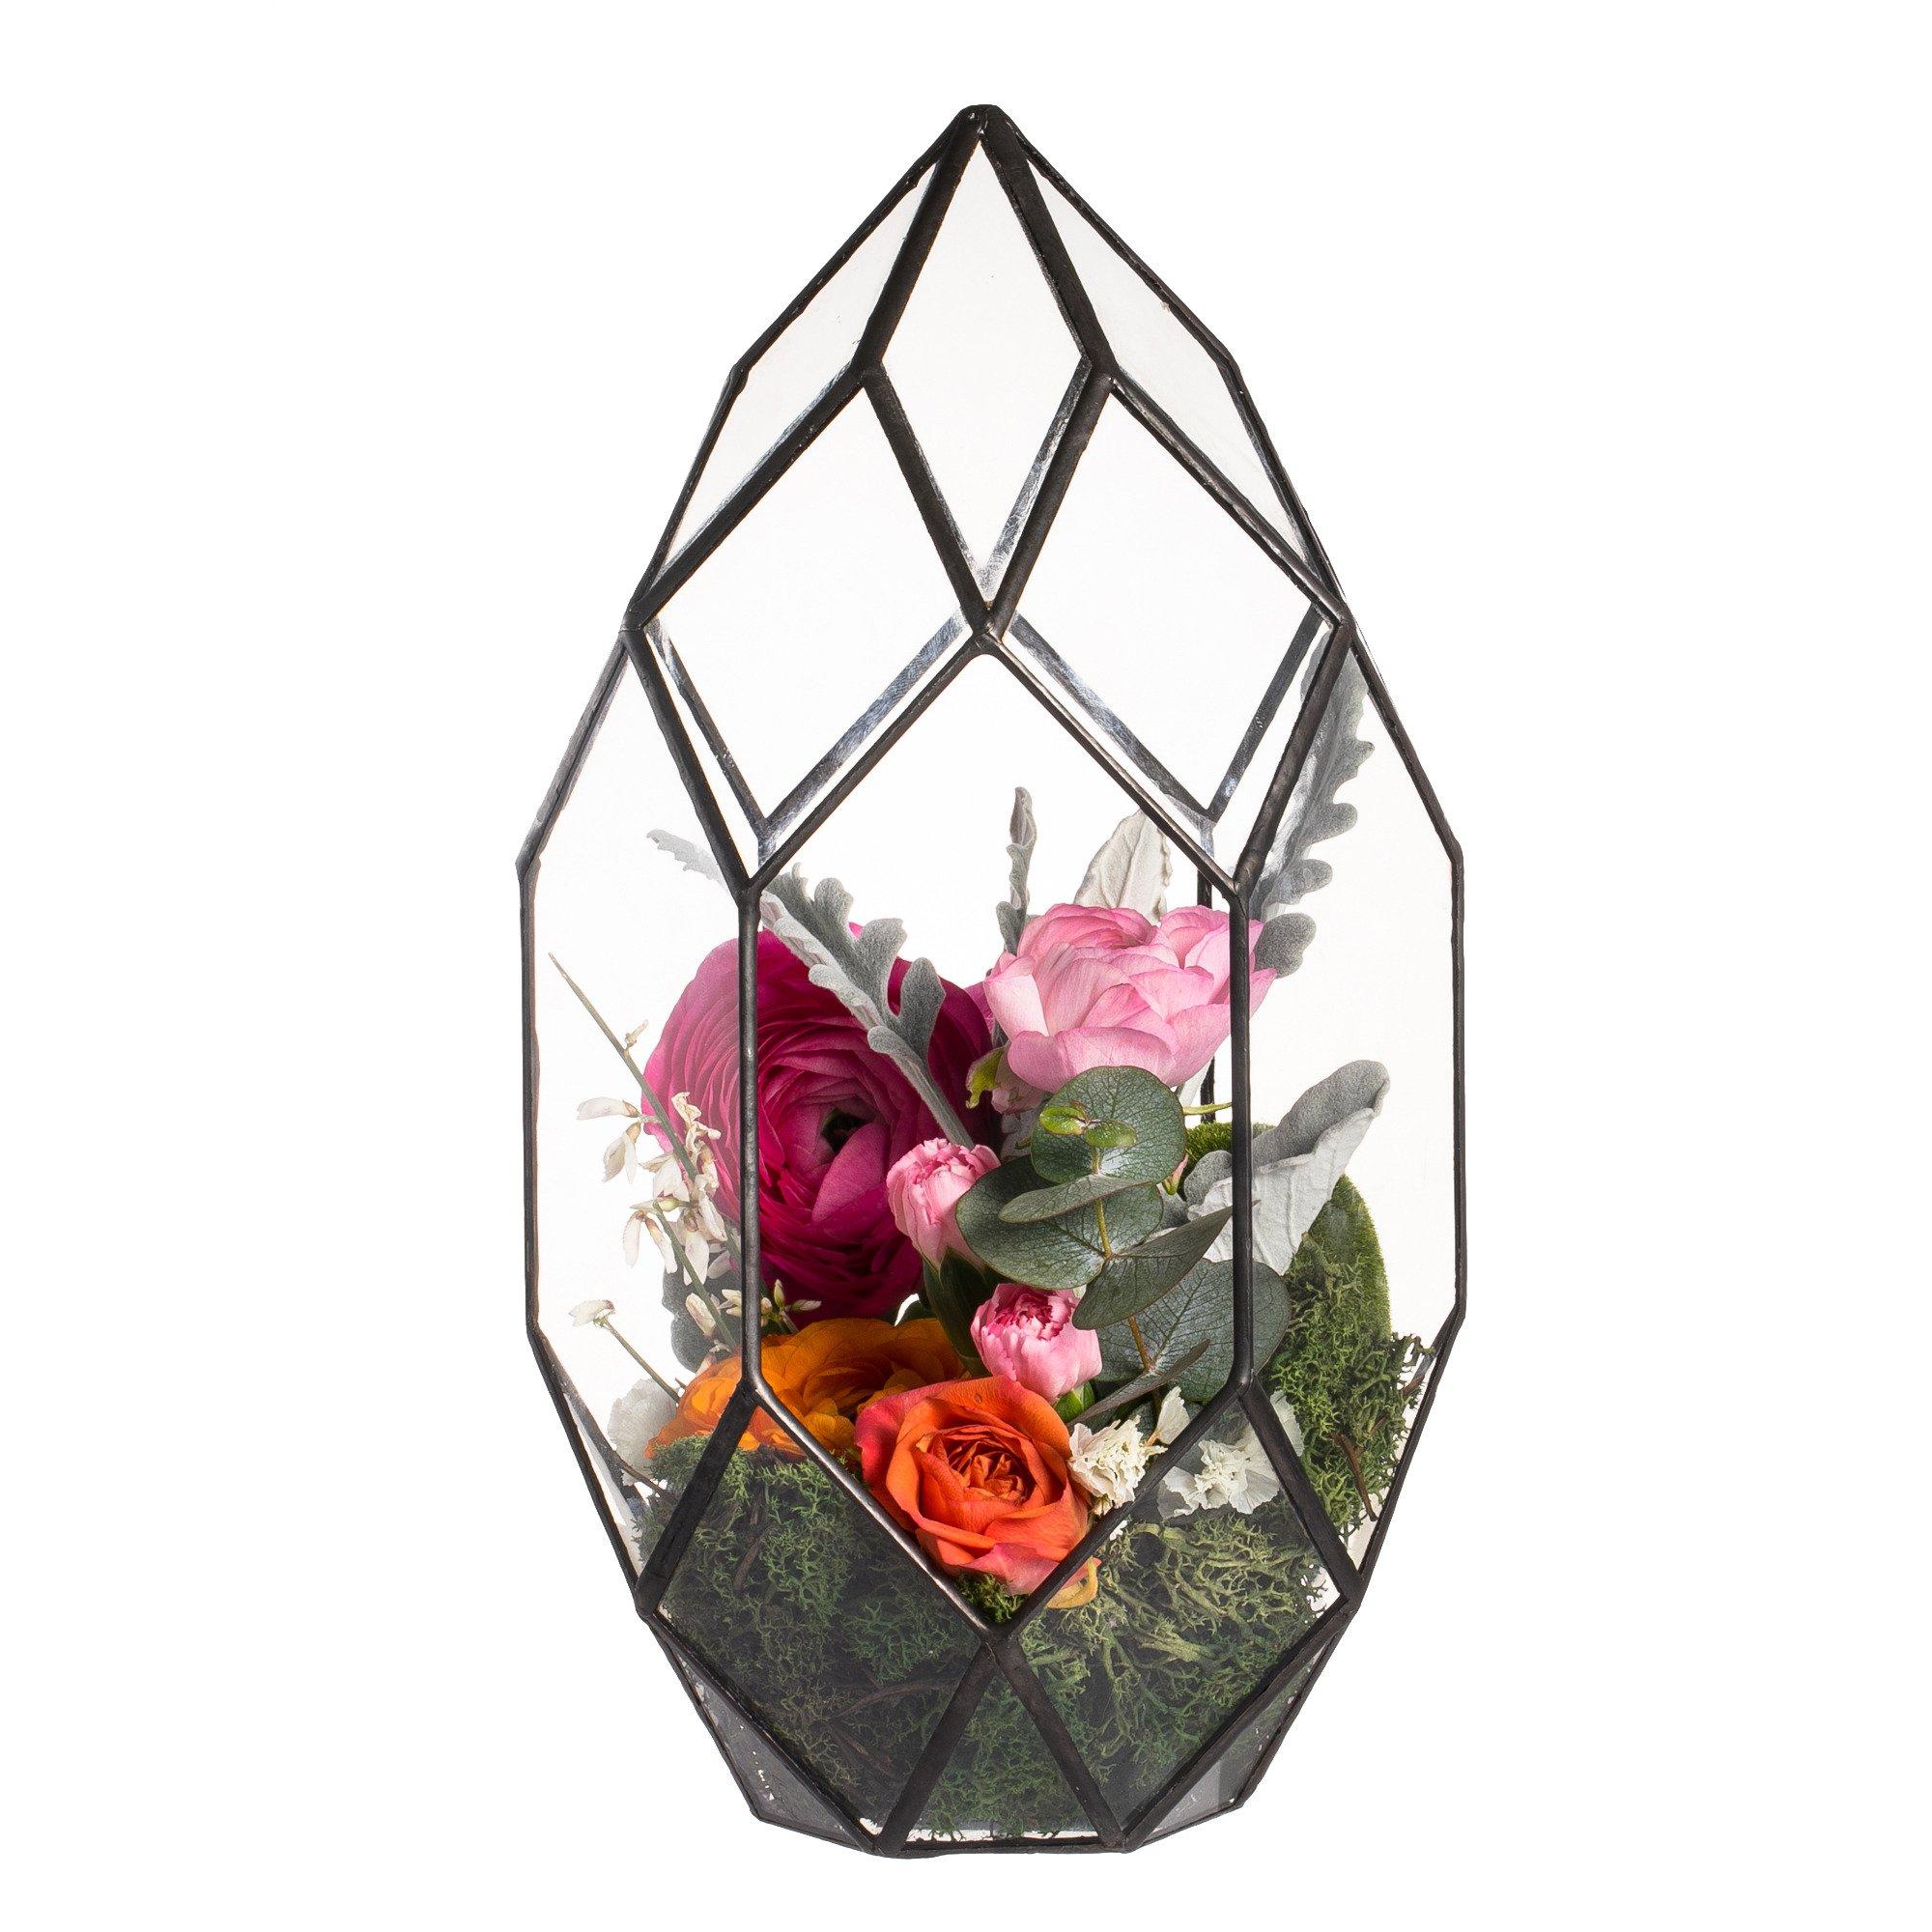 Black Oval Egg Geometric Glass Terrarium Centerpiece Candle Holder Lantern Wedding Party Decoration Ornament Indoor Desktop Flowers Container